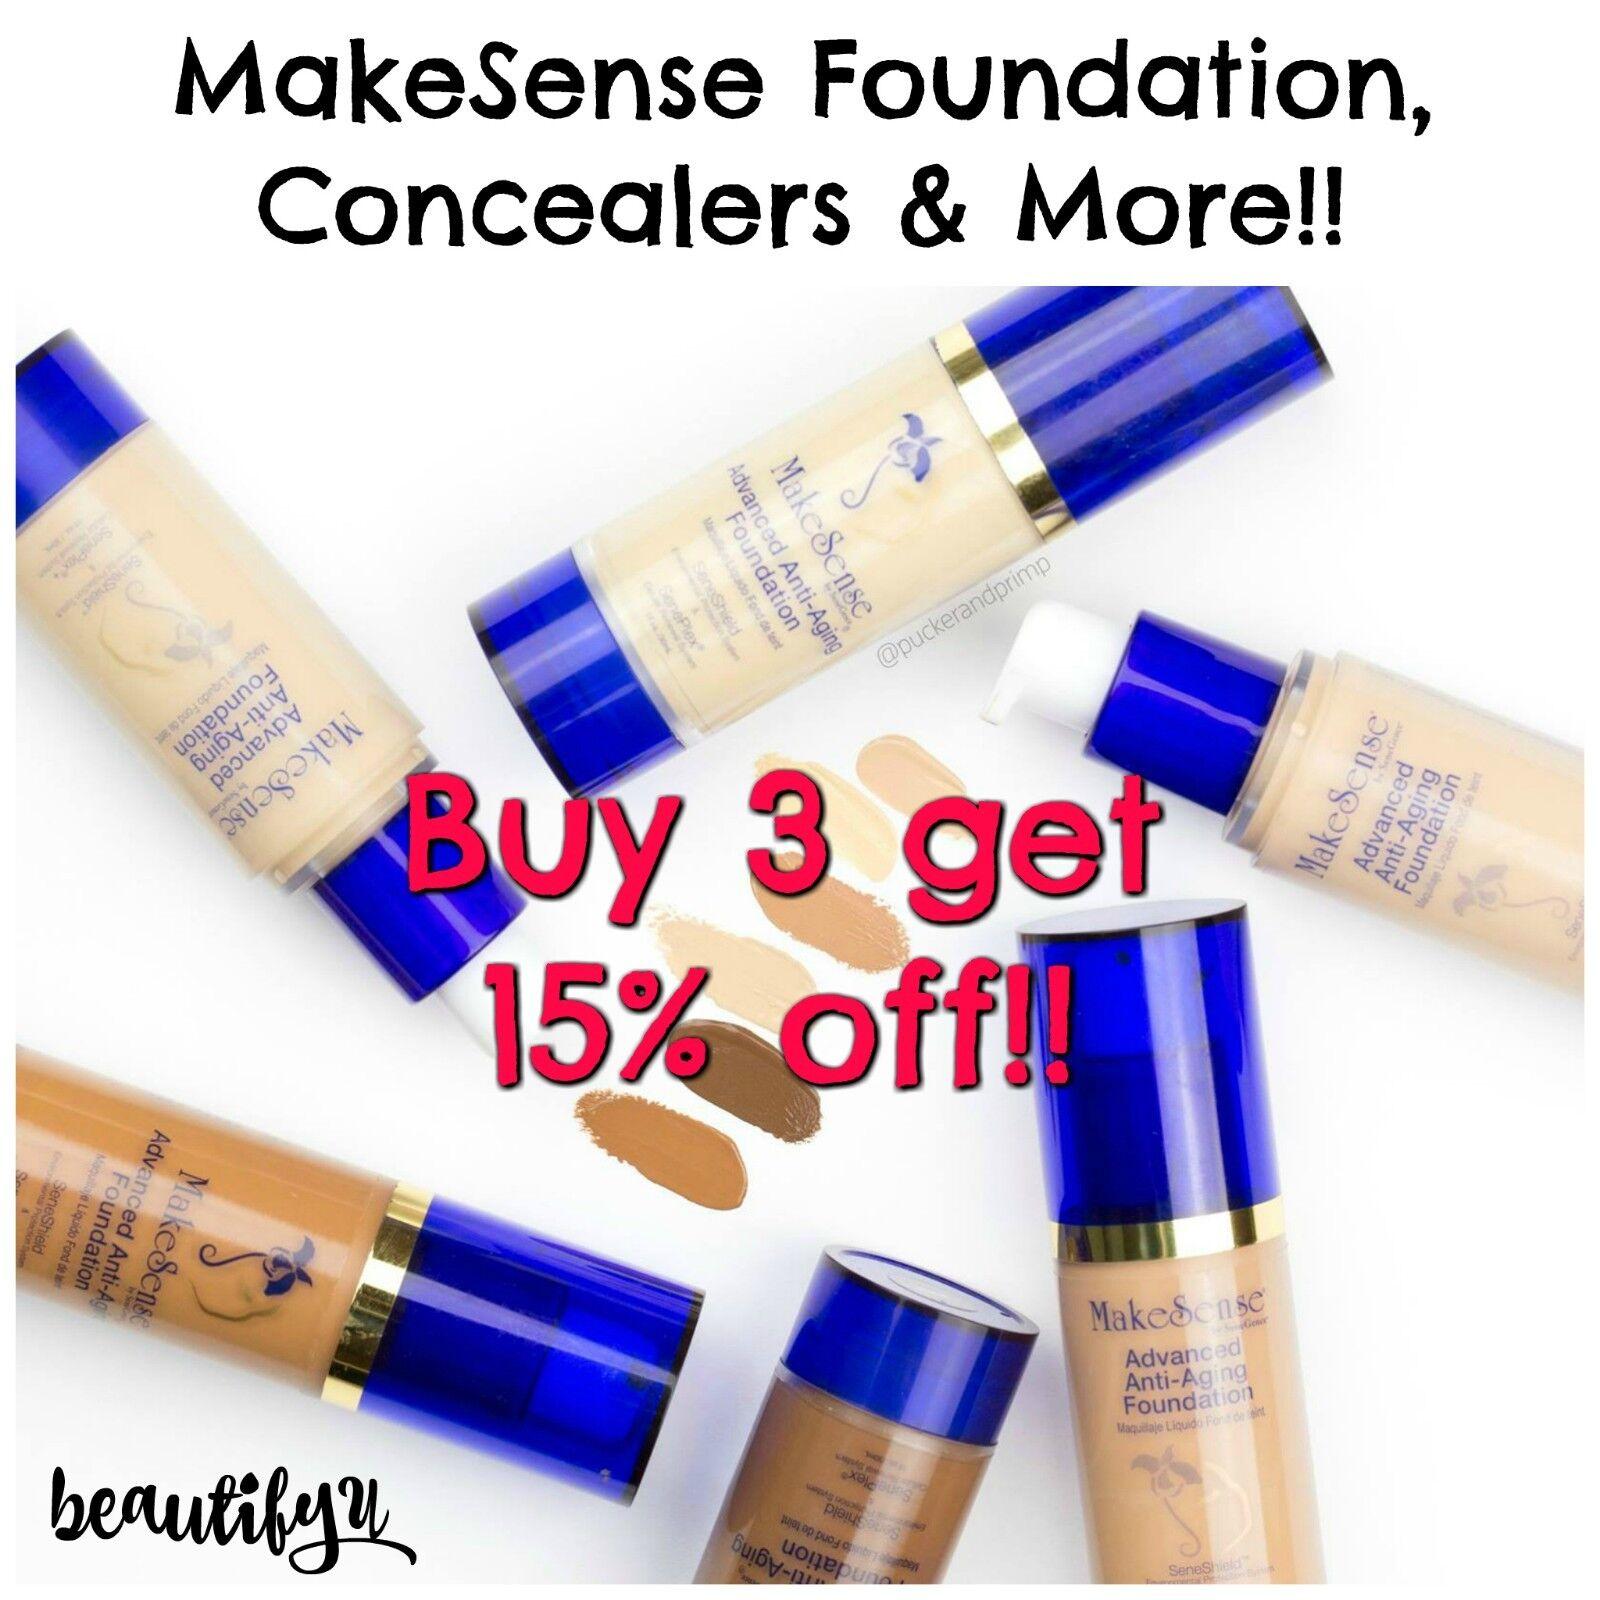 MakeSense Foundation, Pearlizer, Concealers, & Powder! Makeu